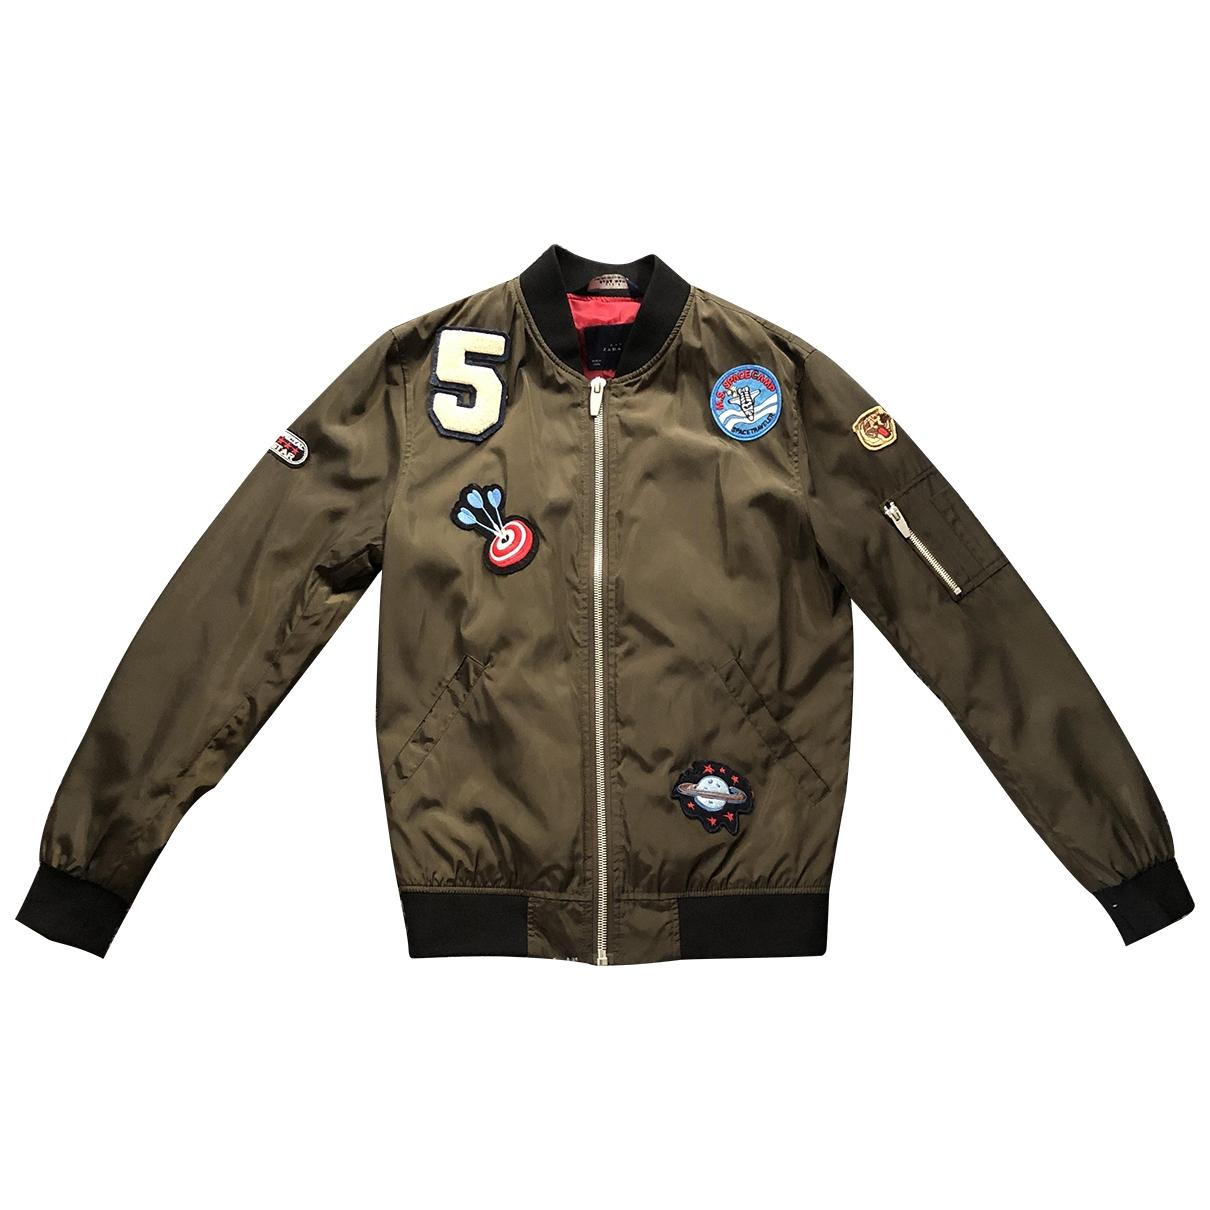 Zara \N Green jacket  for Men S International